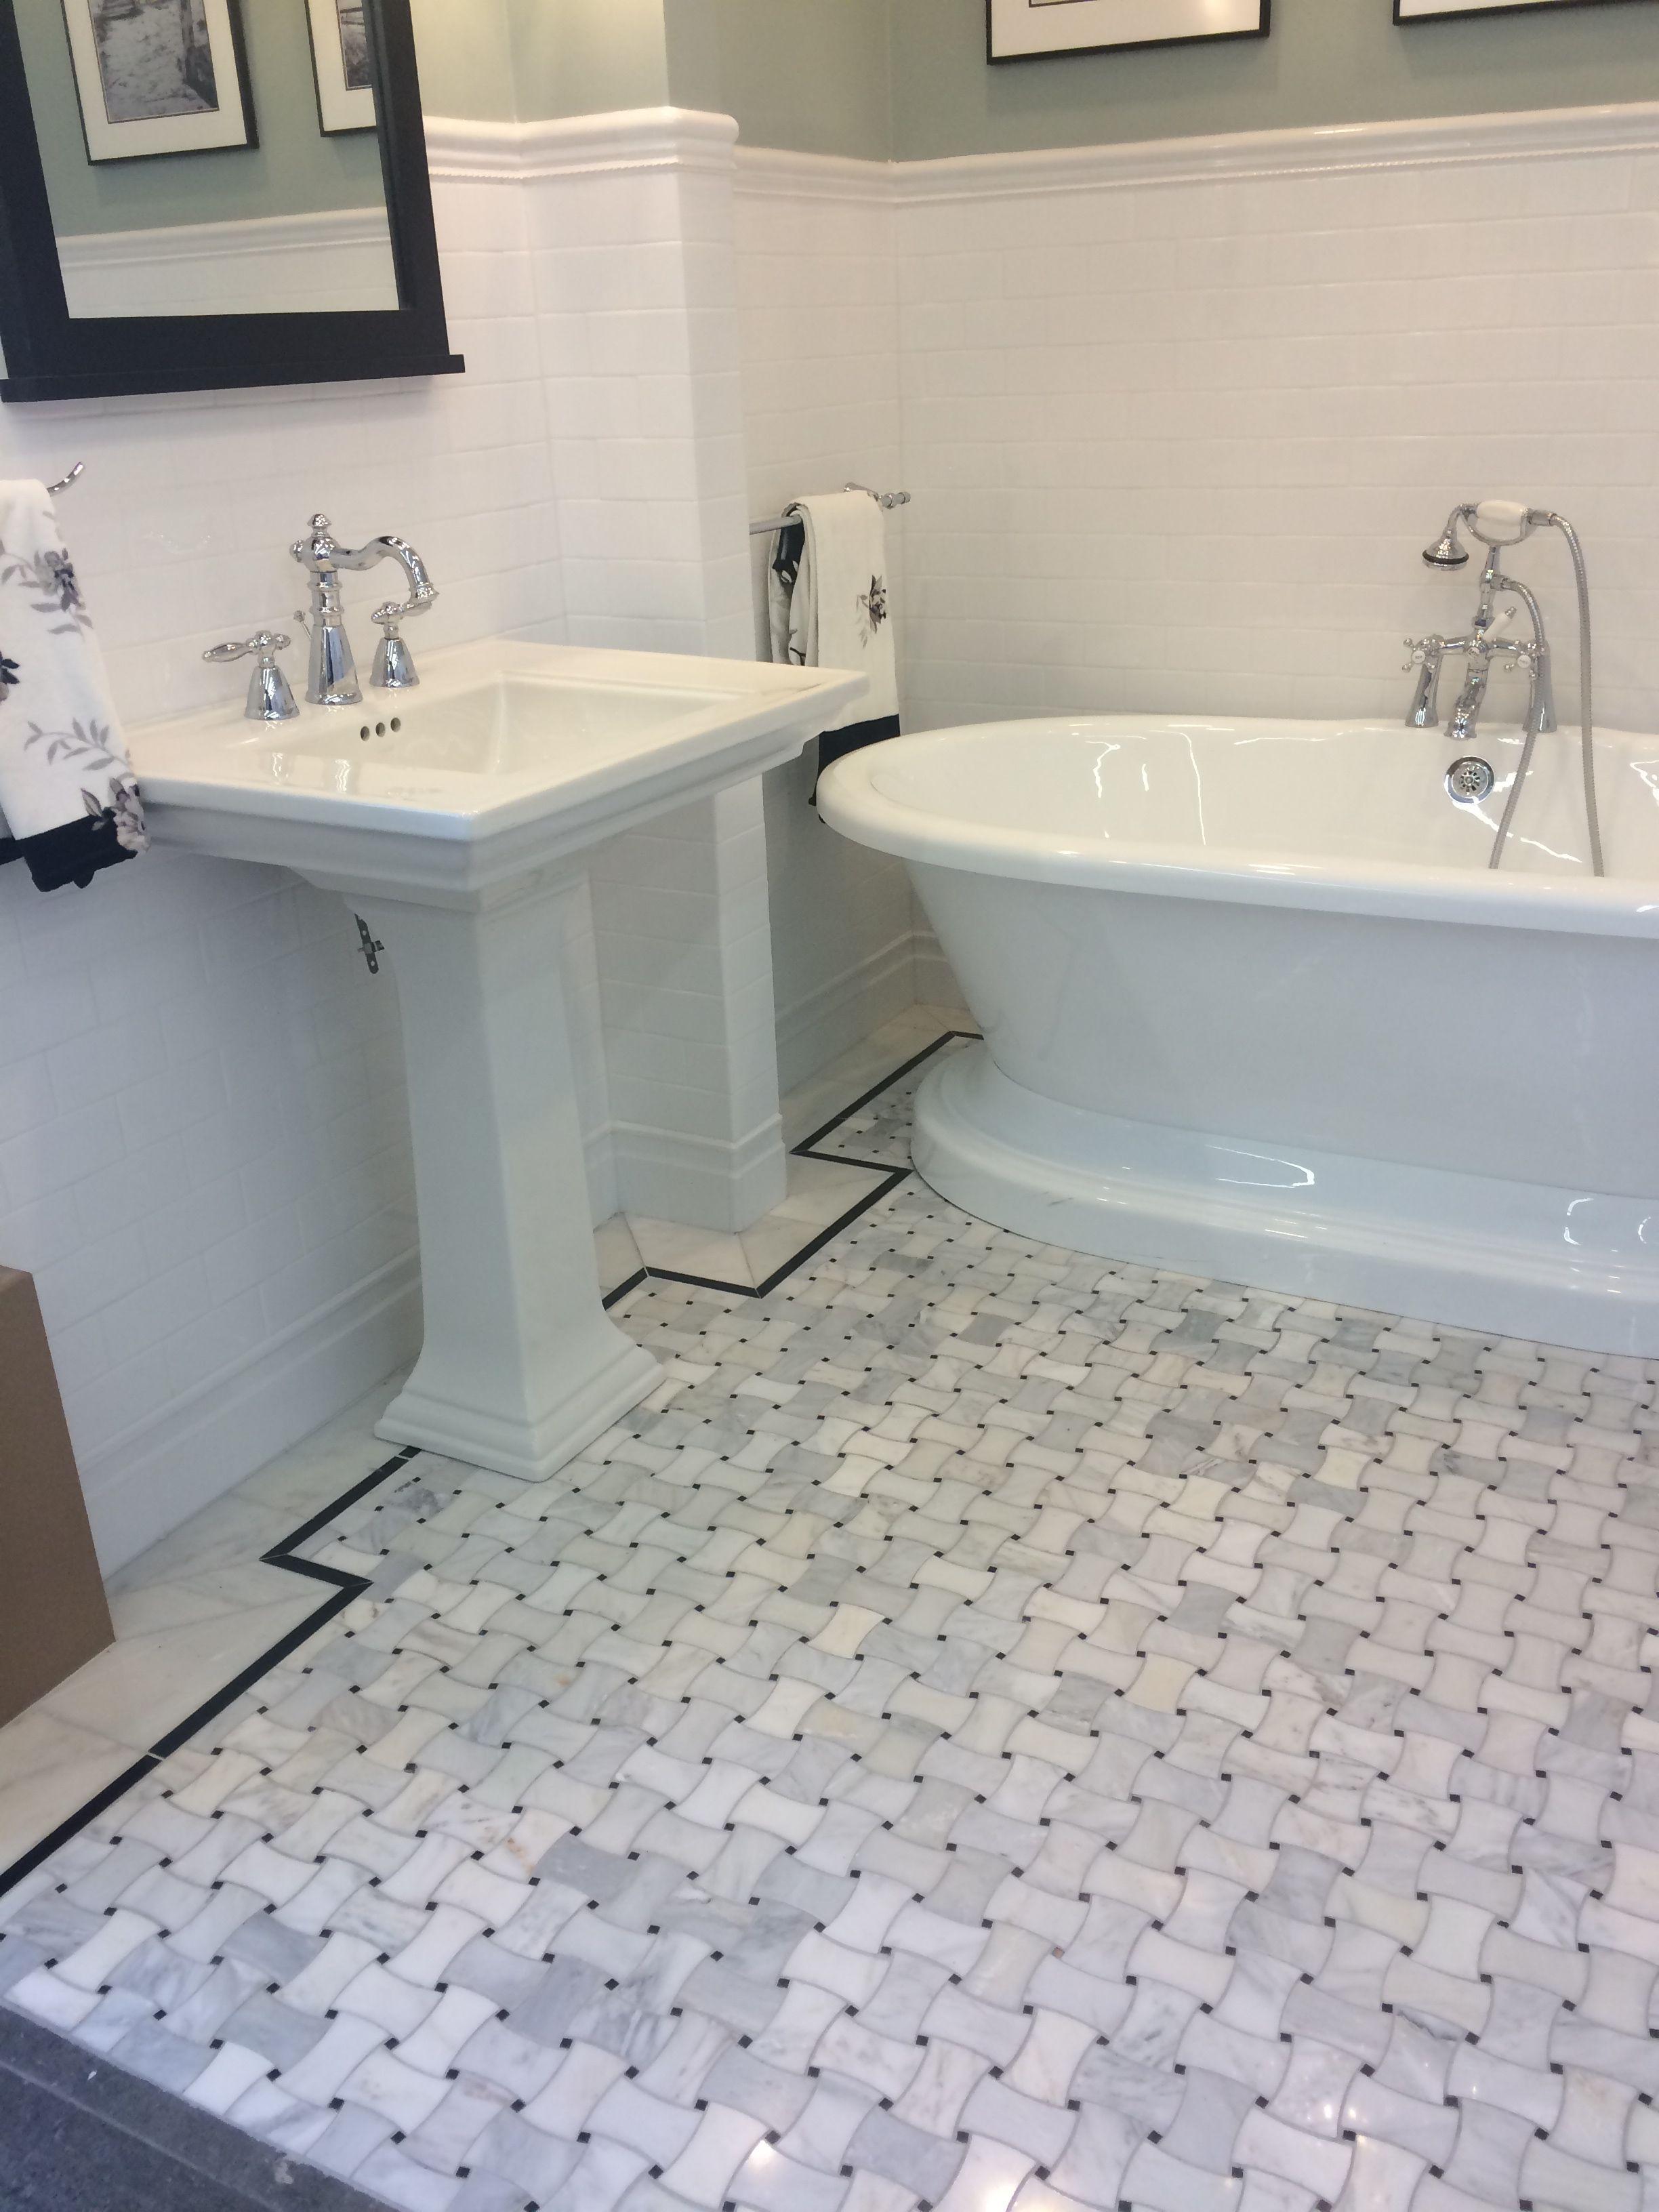 basketweave tile bathroom. Shot Taken At The Tile Shop In Bloomington, MN: Basketweave Floor With Black Bathroom